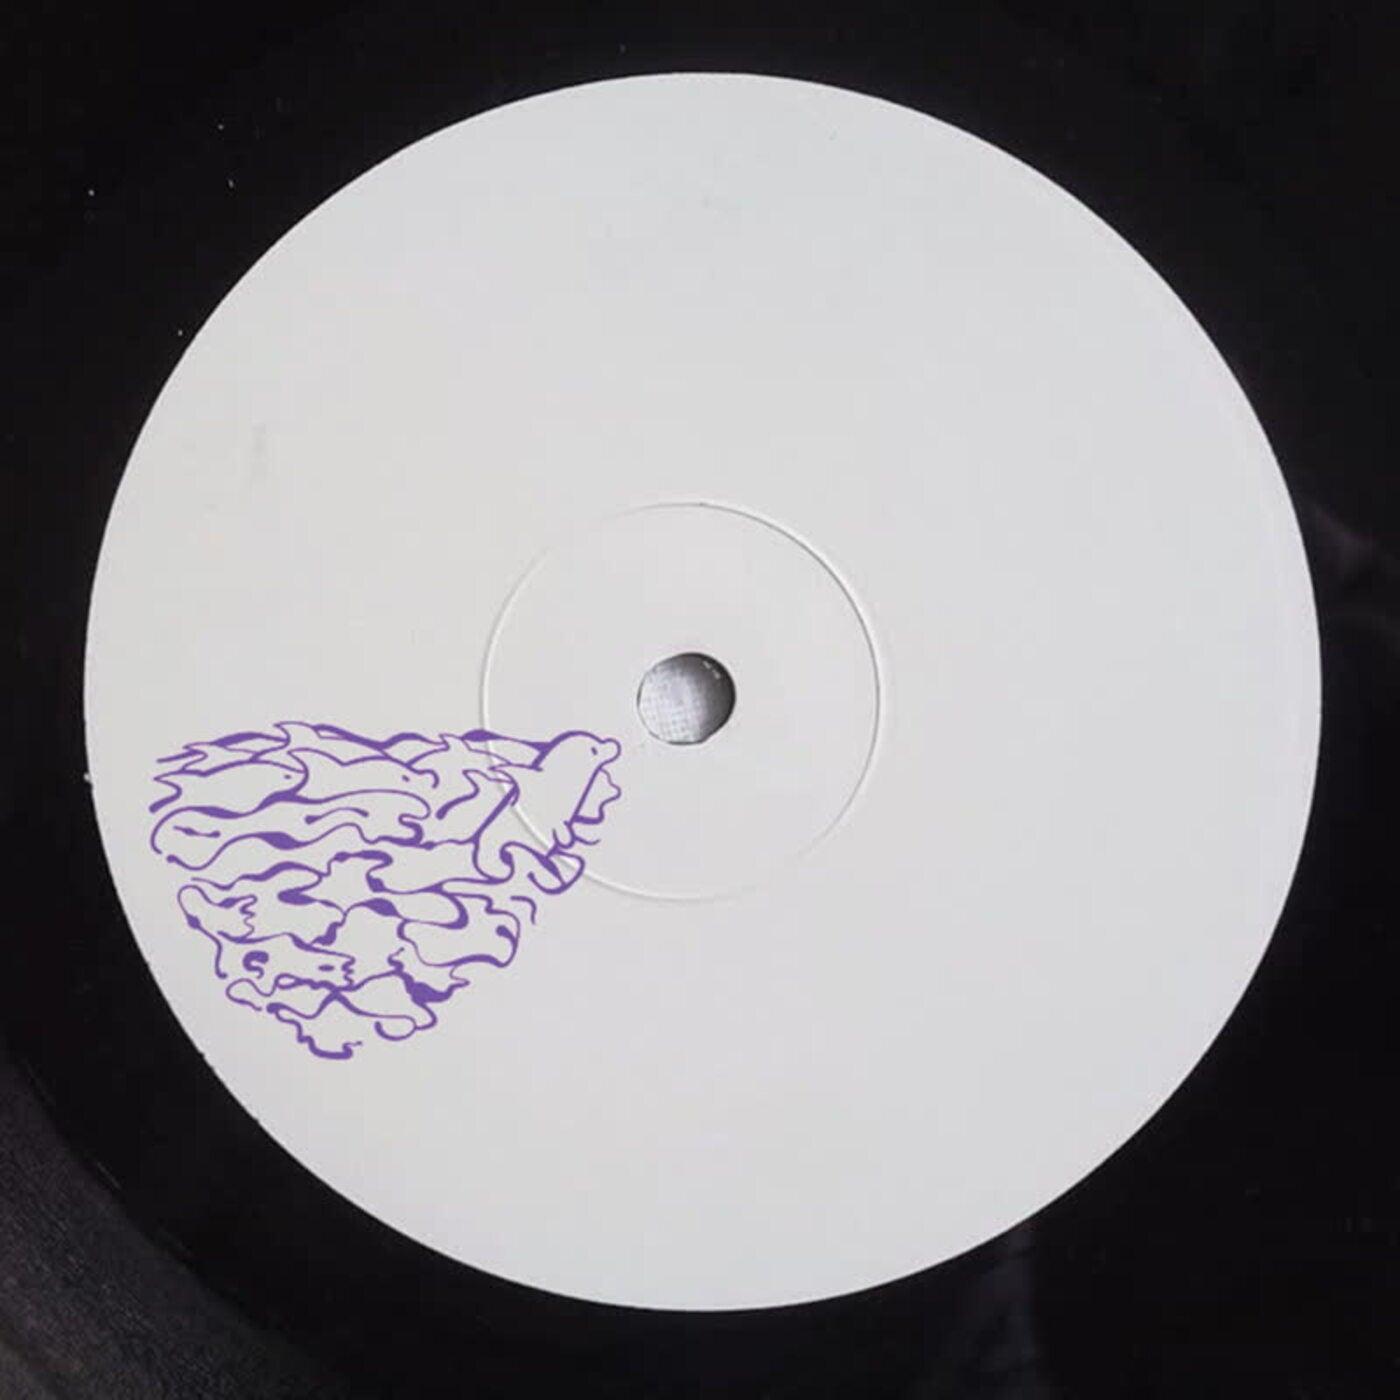 Framboise Baby (Original Mix)